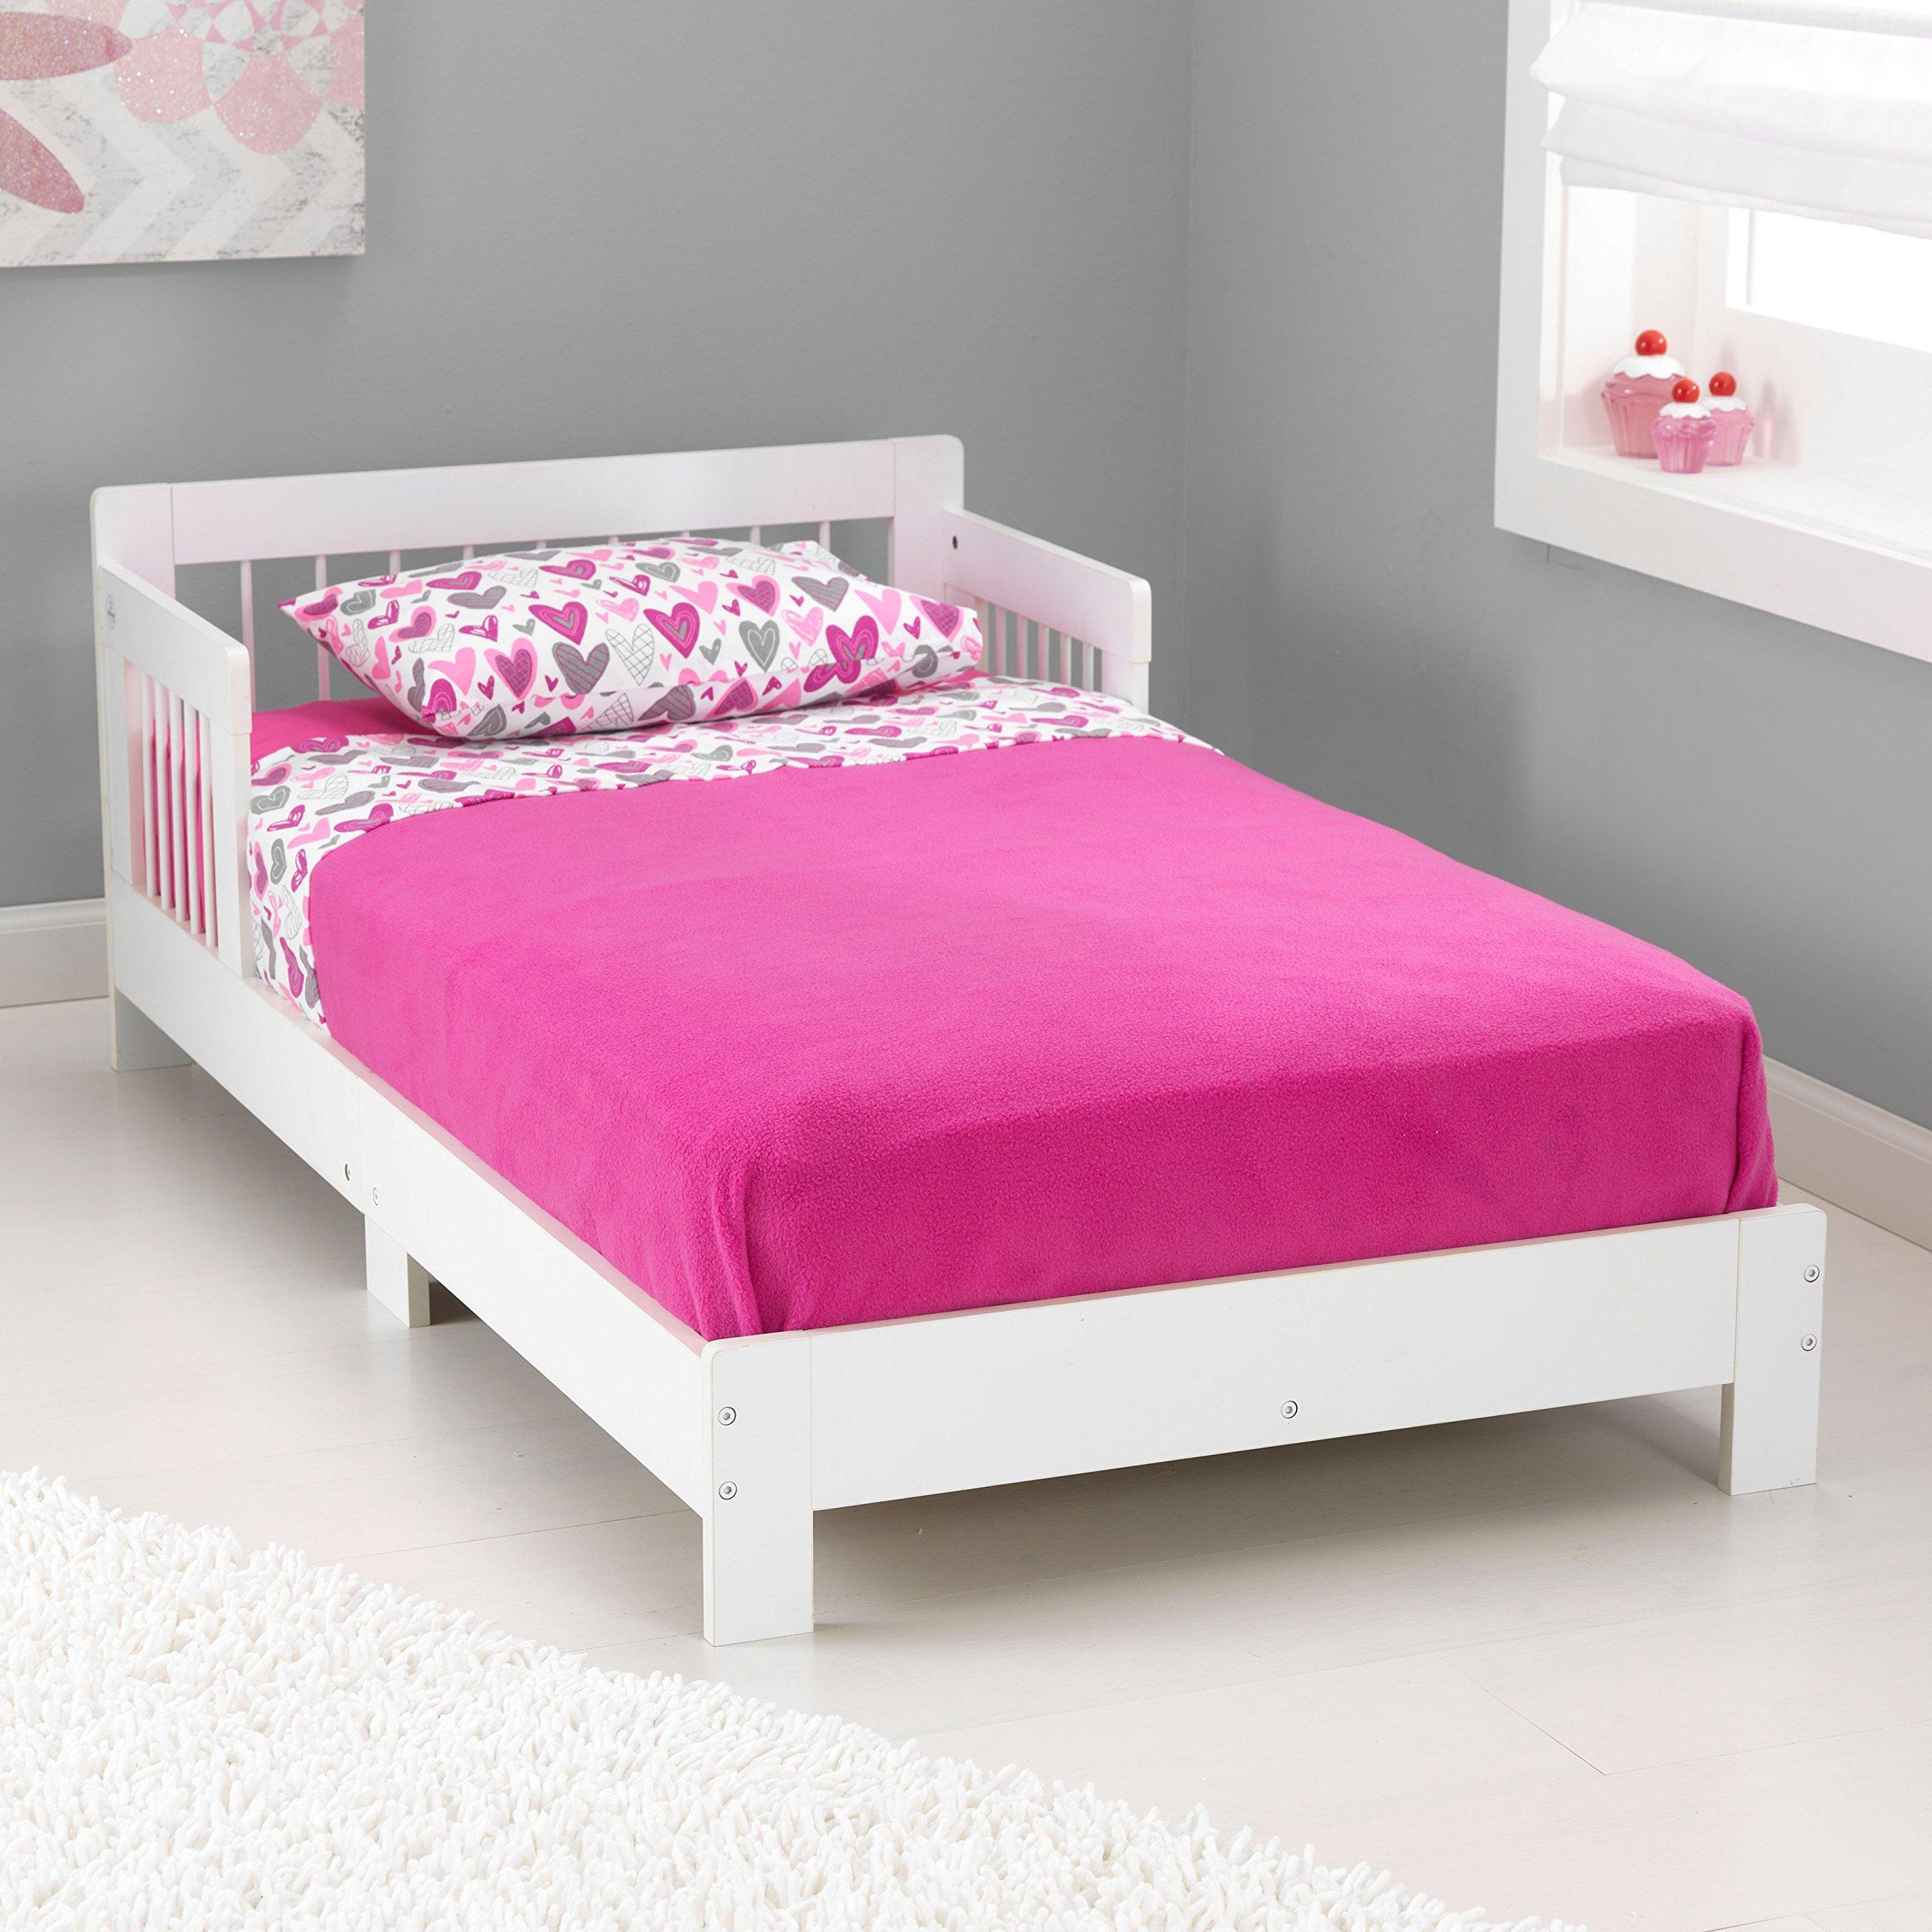 KidKraft Toddler Houston Bed, White by KidKraft (Image #2)